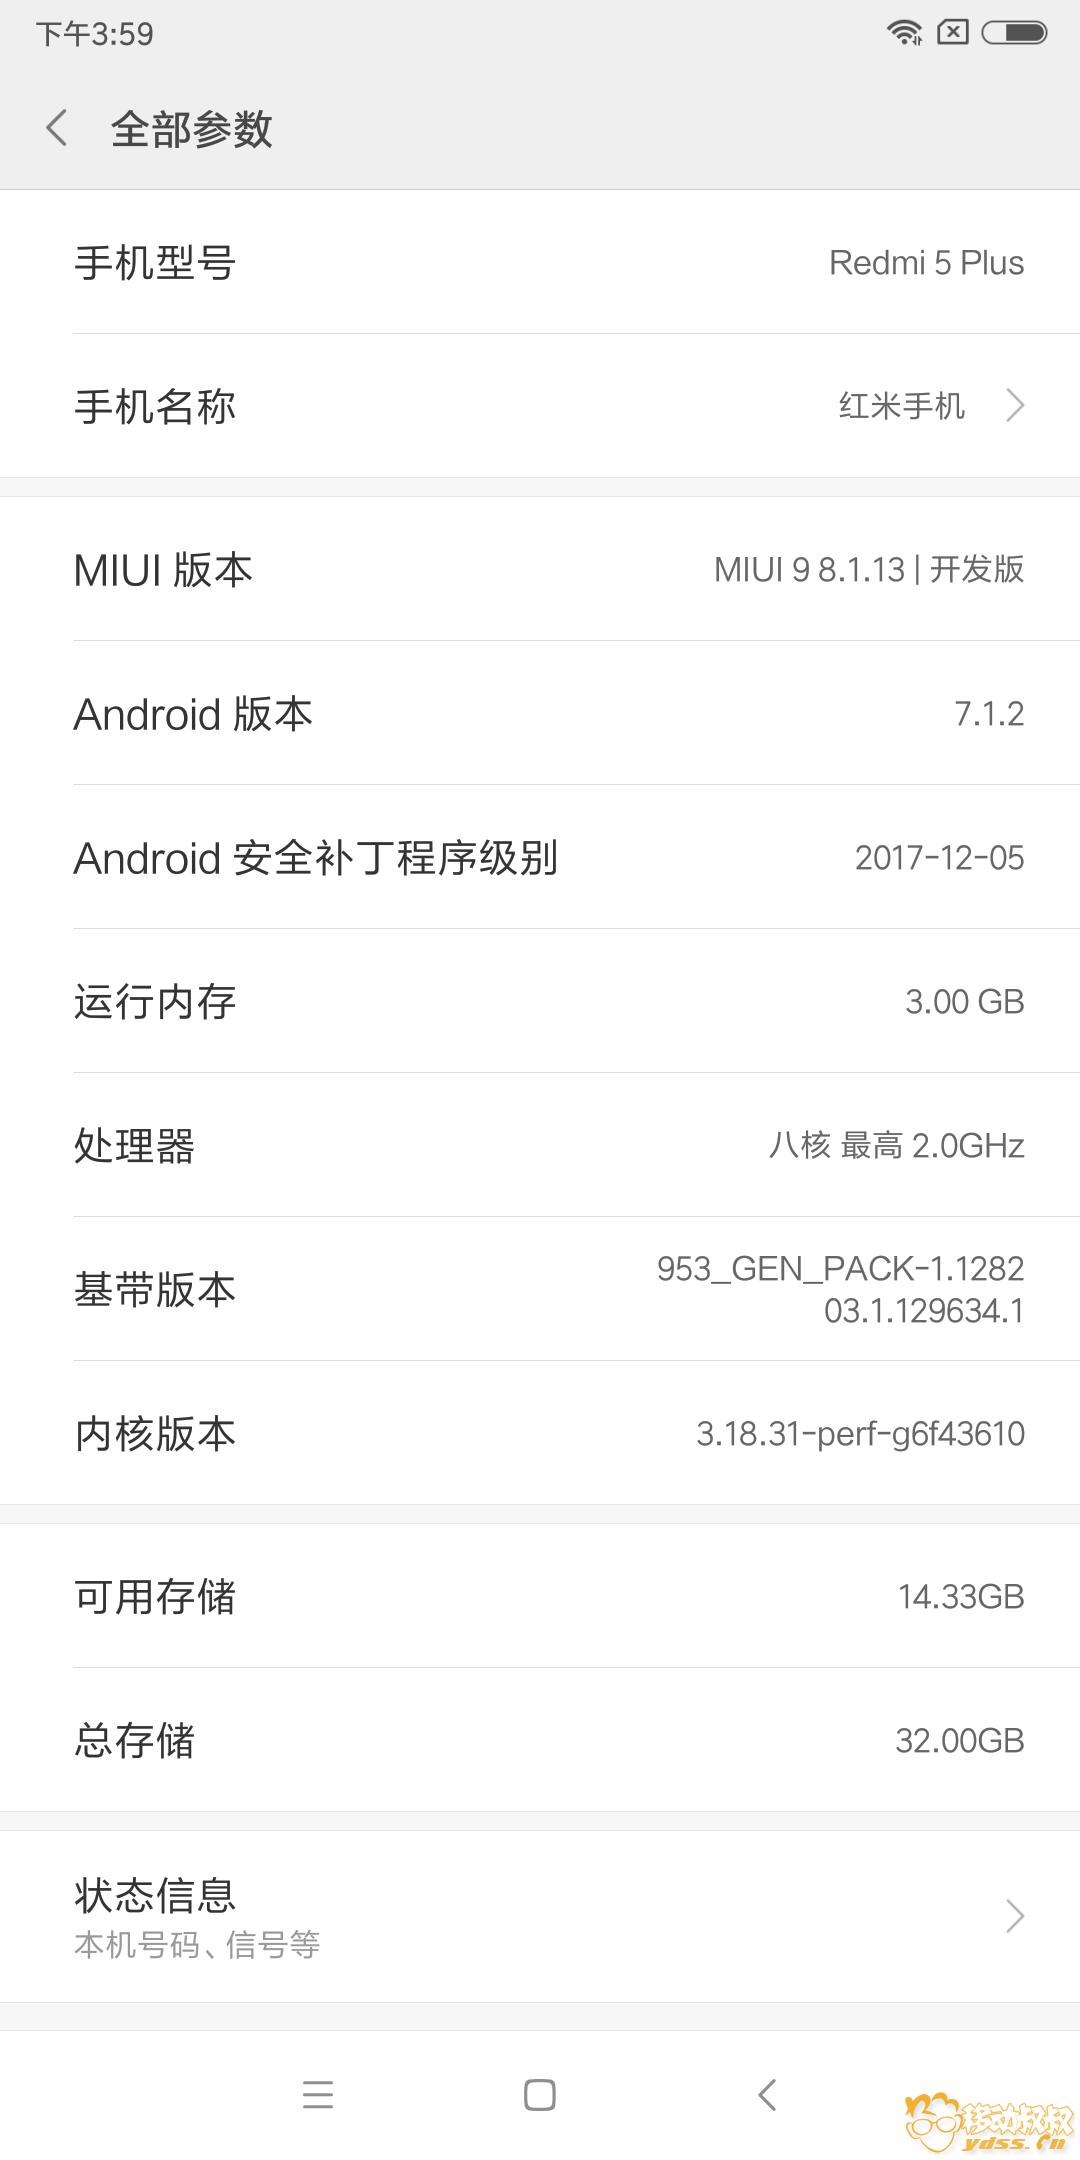 Screenshot_2018-01-13-15-59-44-869_com.android.settings.png